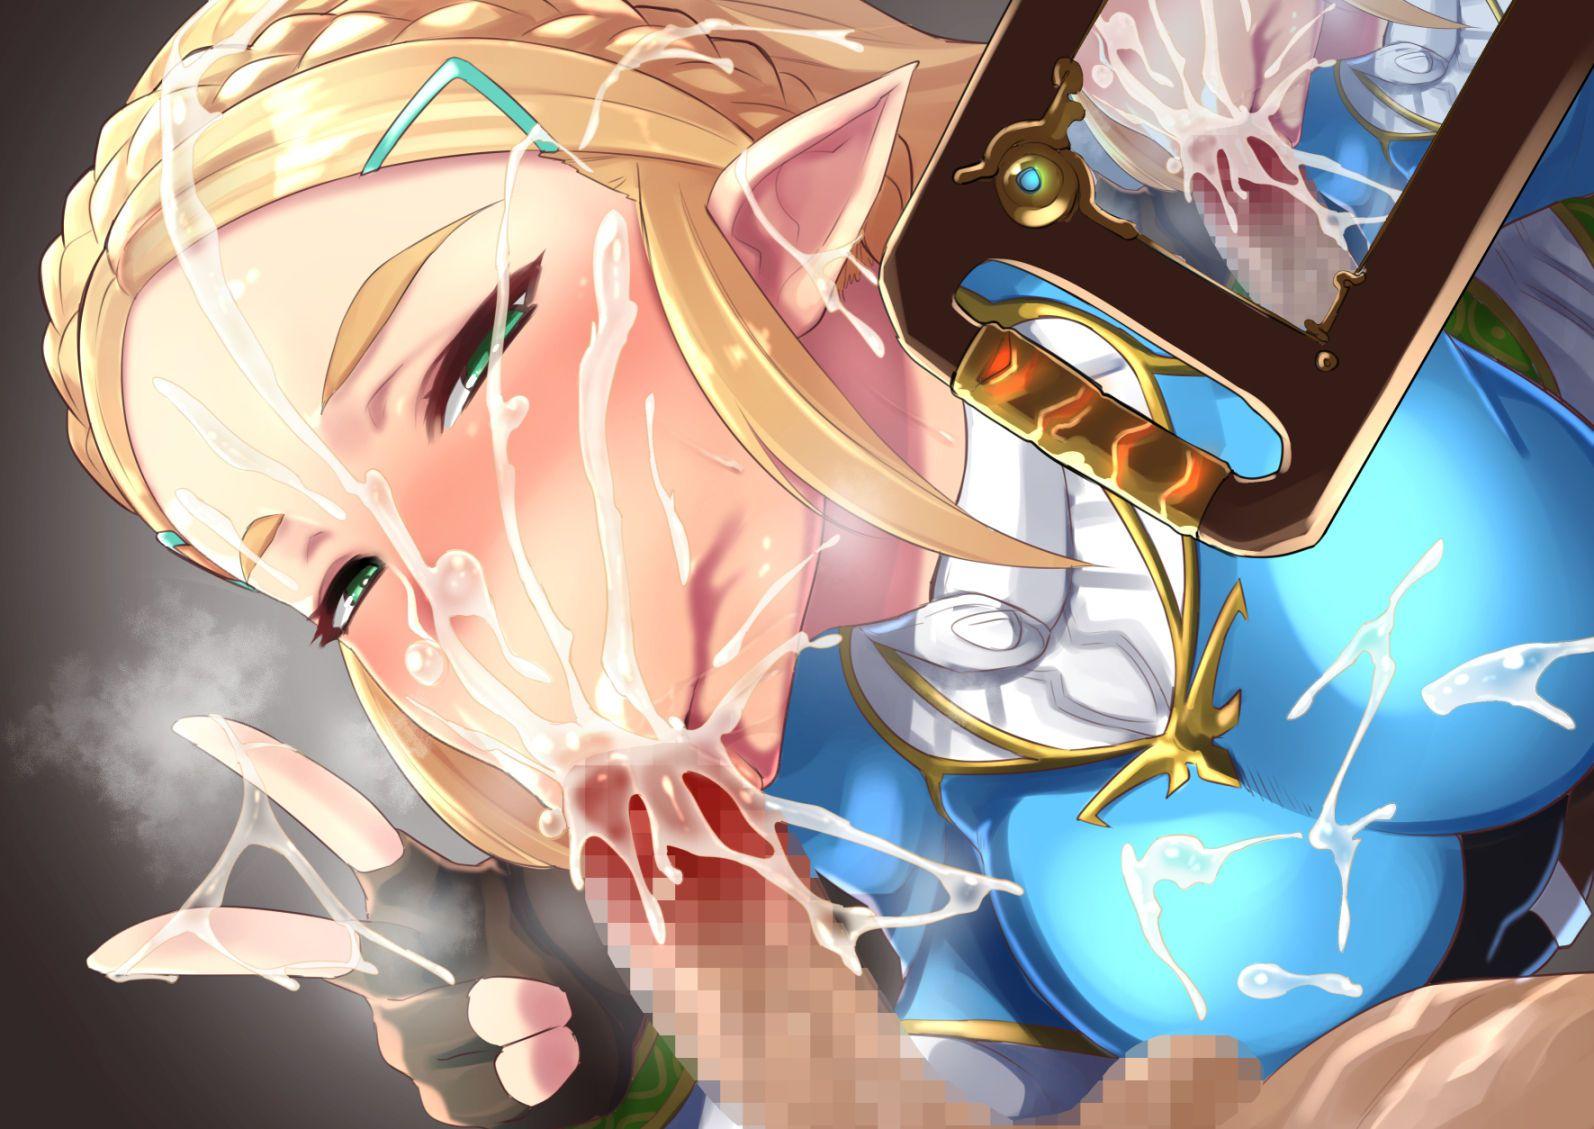 Hyottoko Blow job613